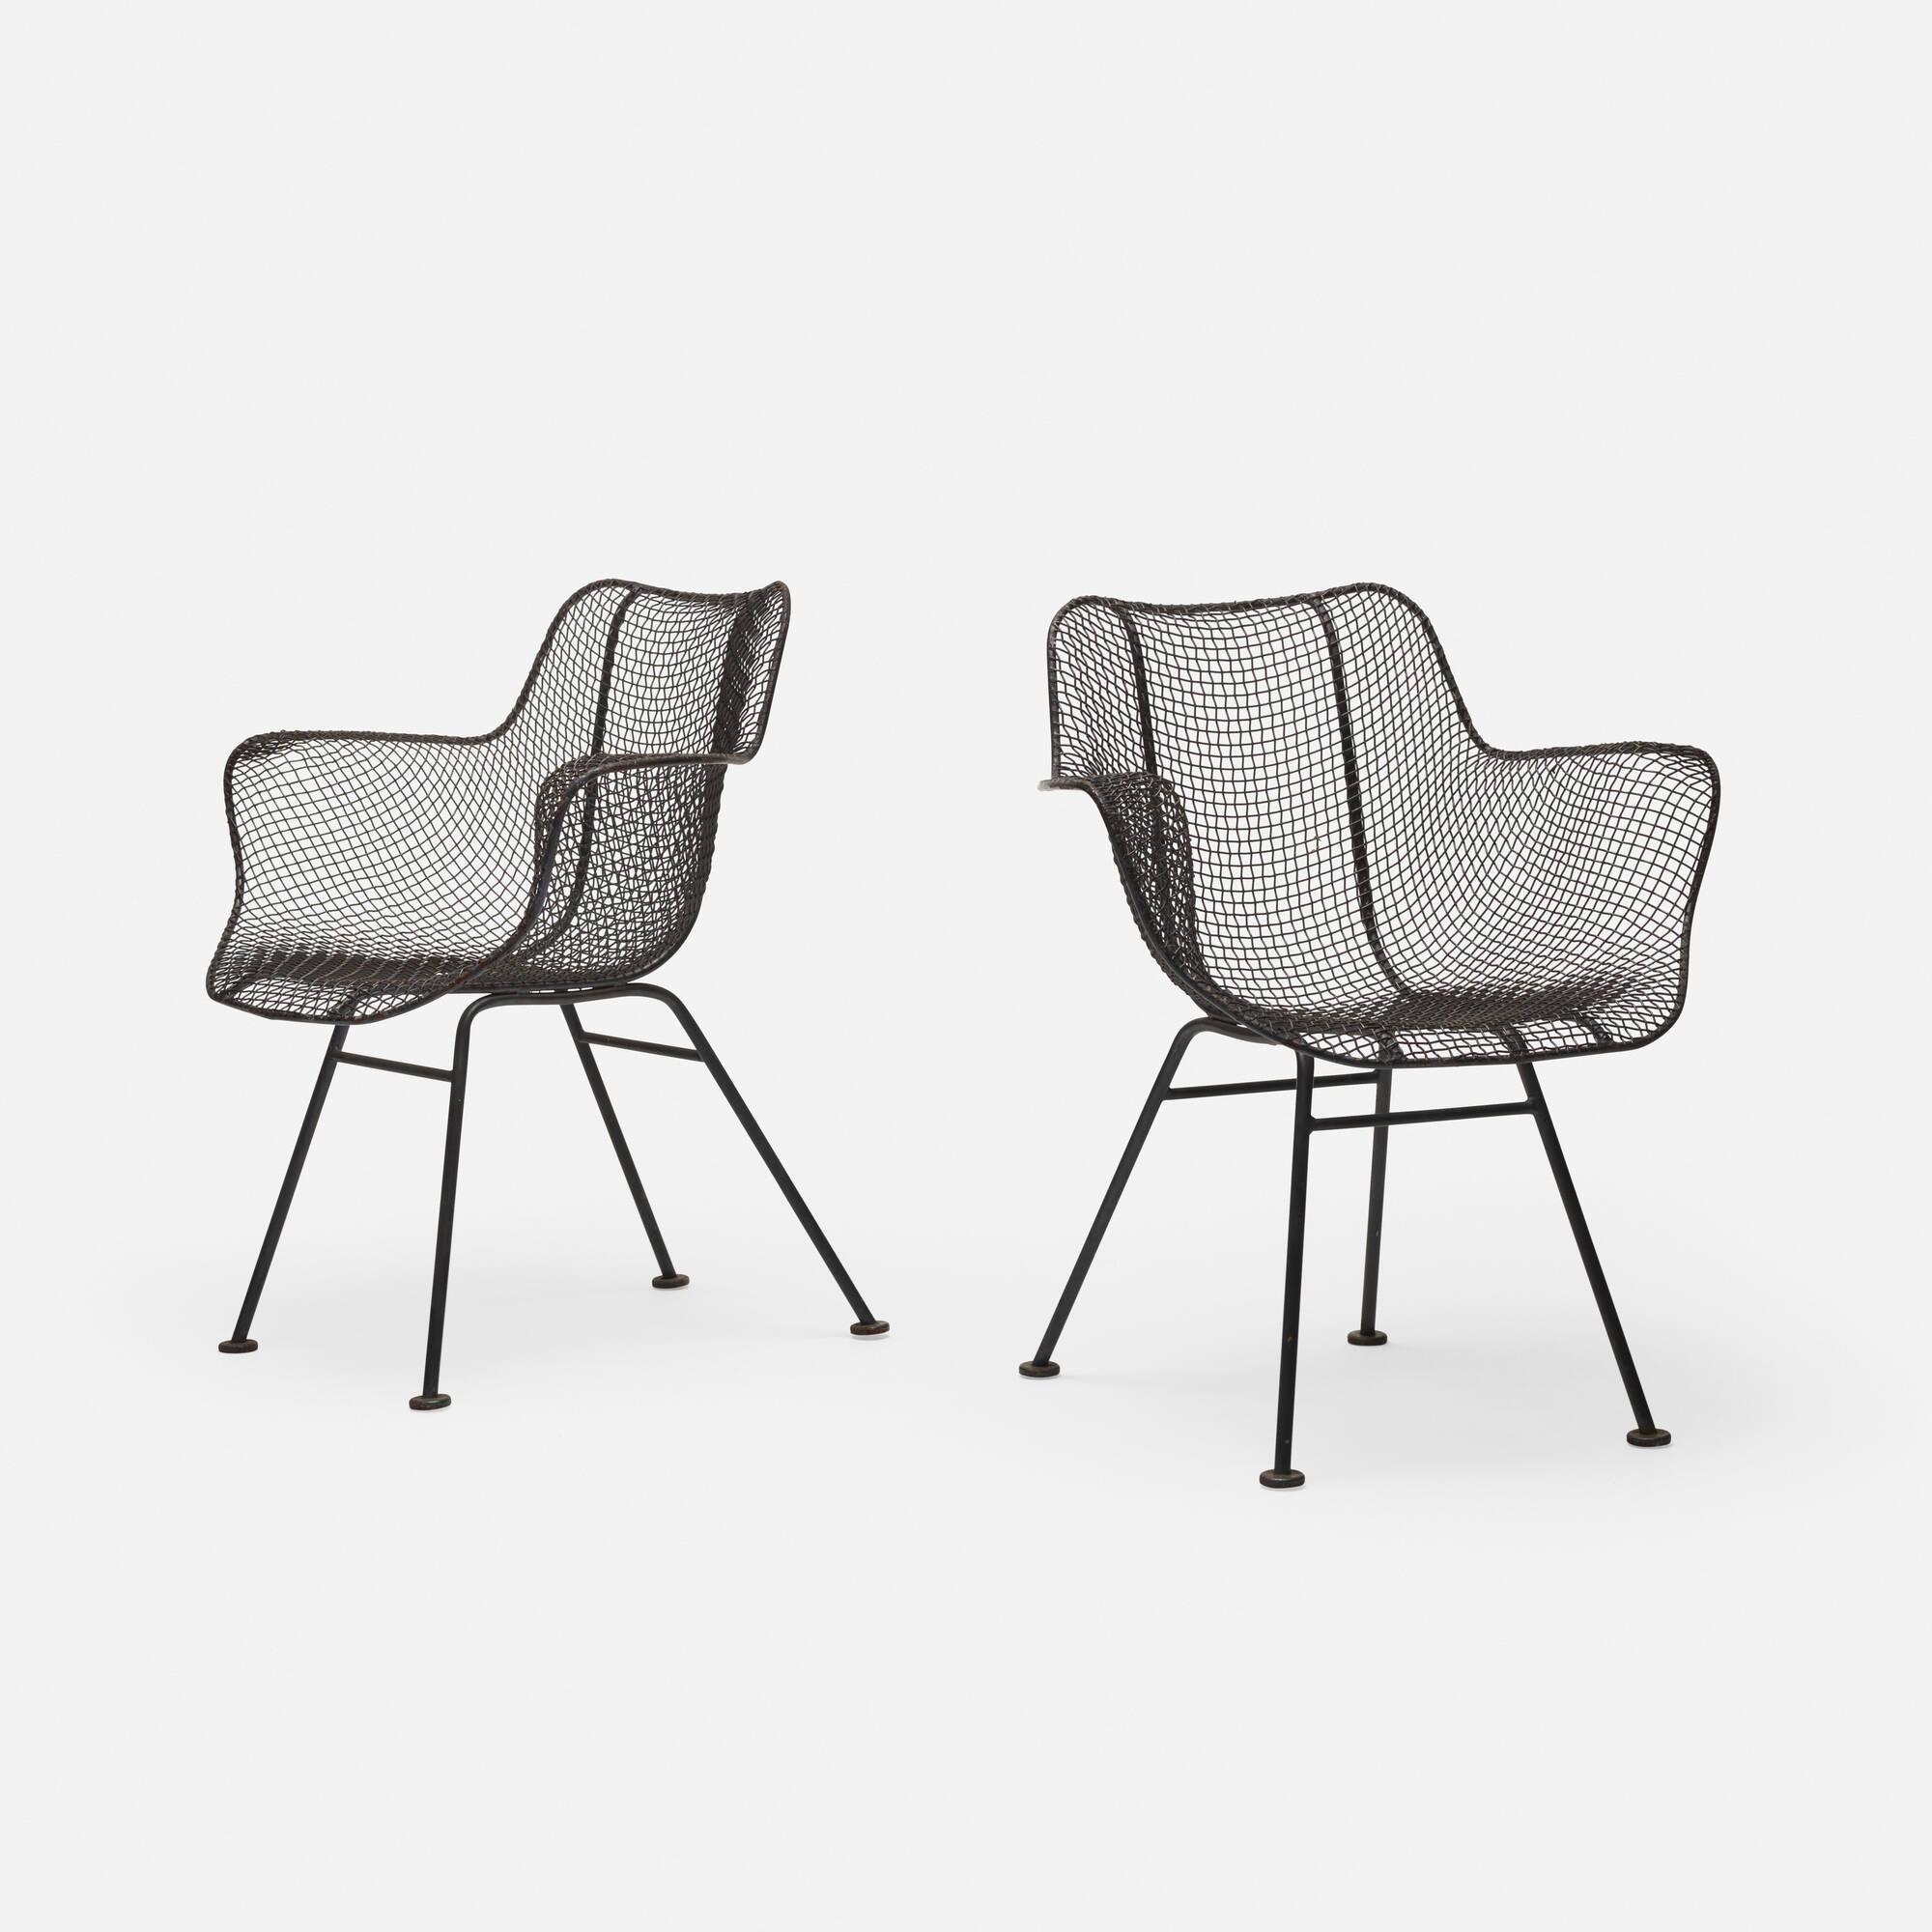 375: Russell Woodard / Sculptura armchairs, pair (1 of 2)